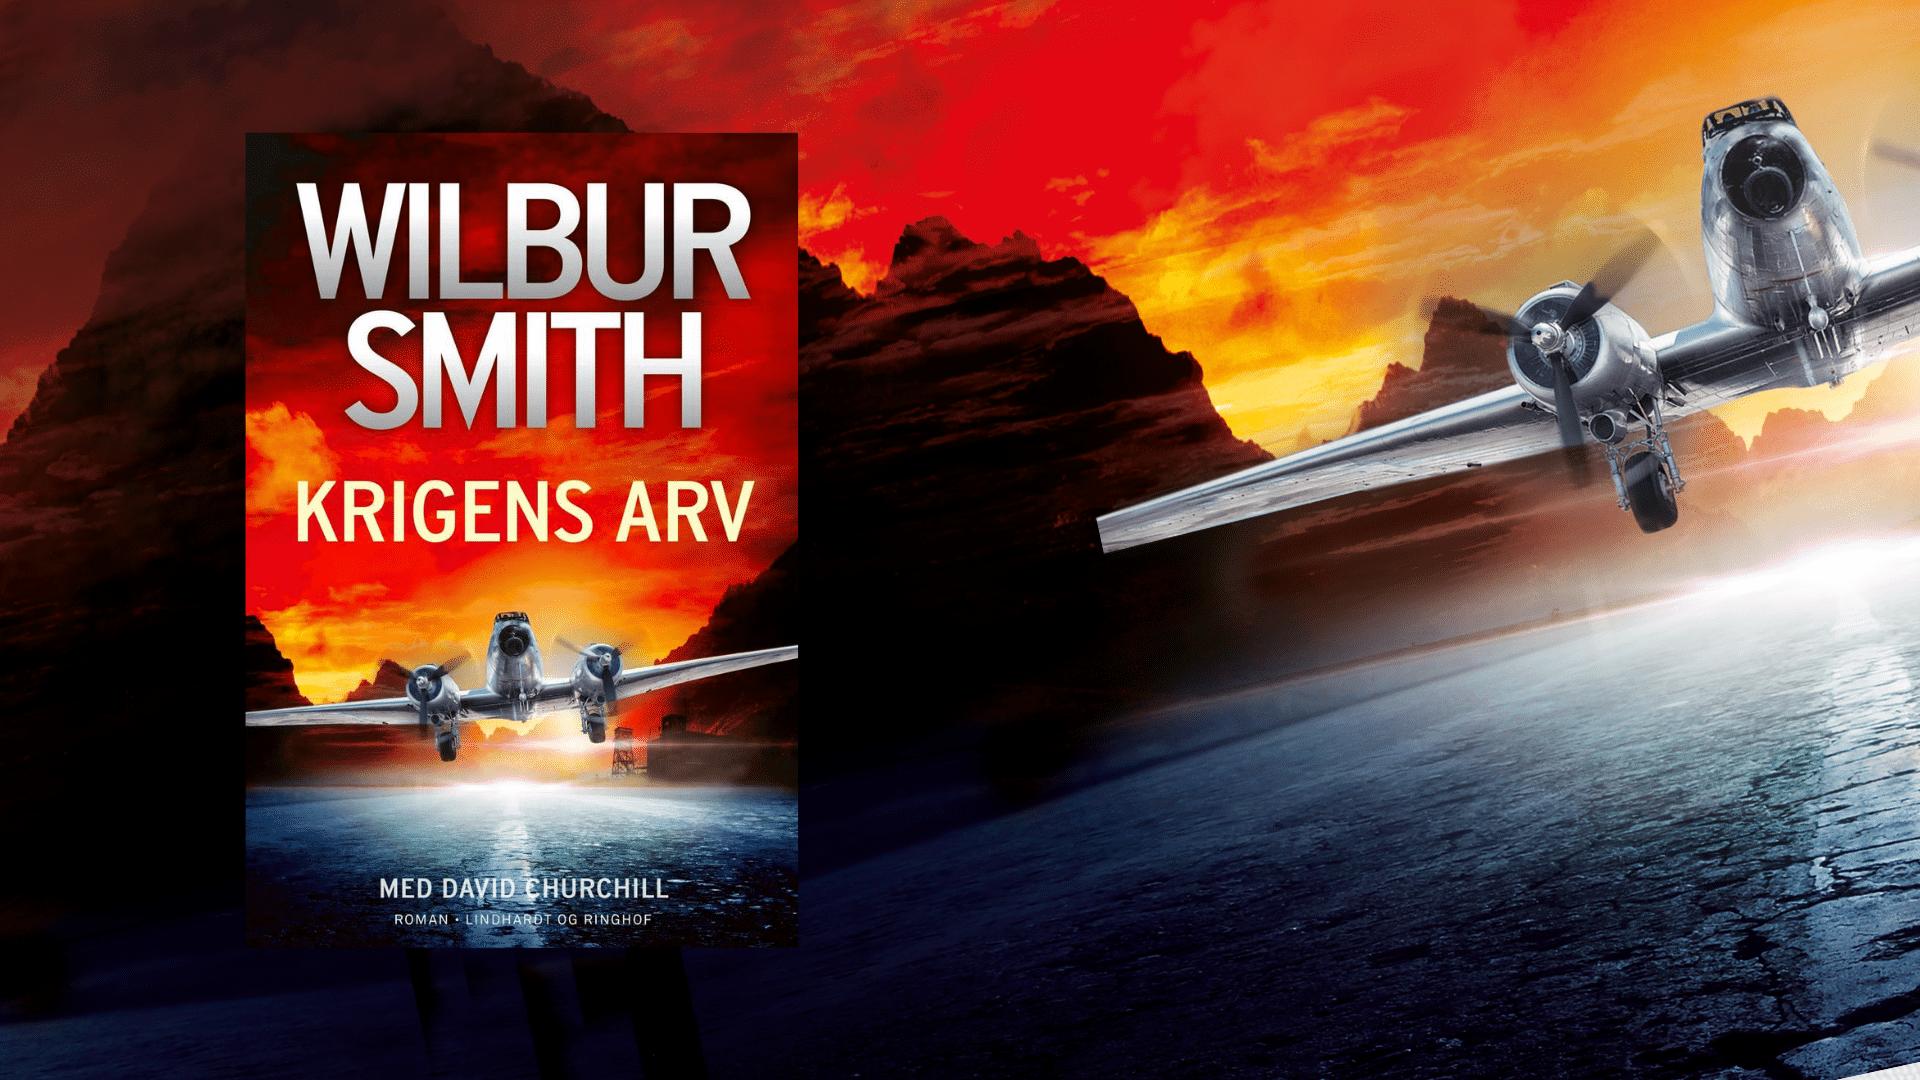 Wilbur Smith, Krigens Arv